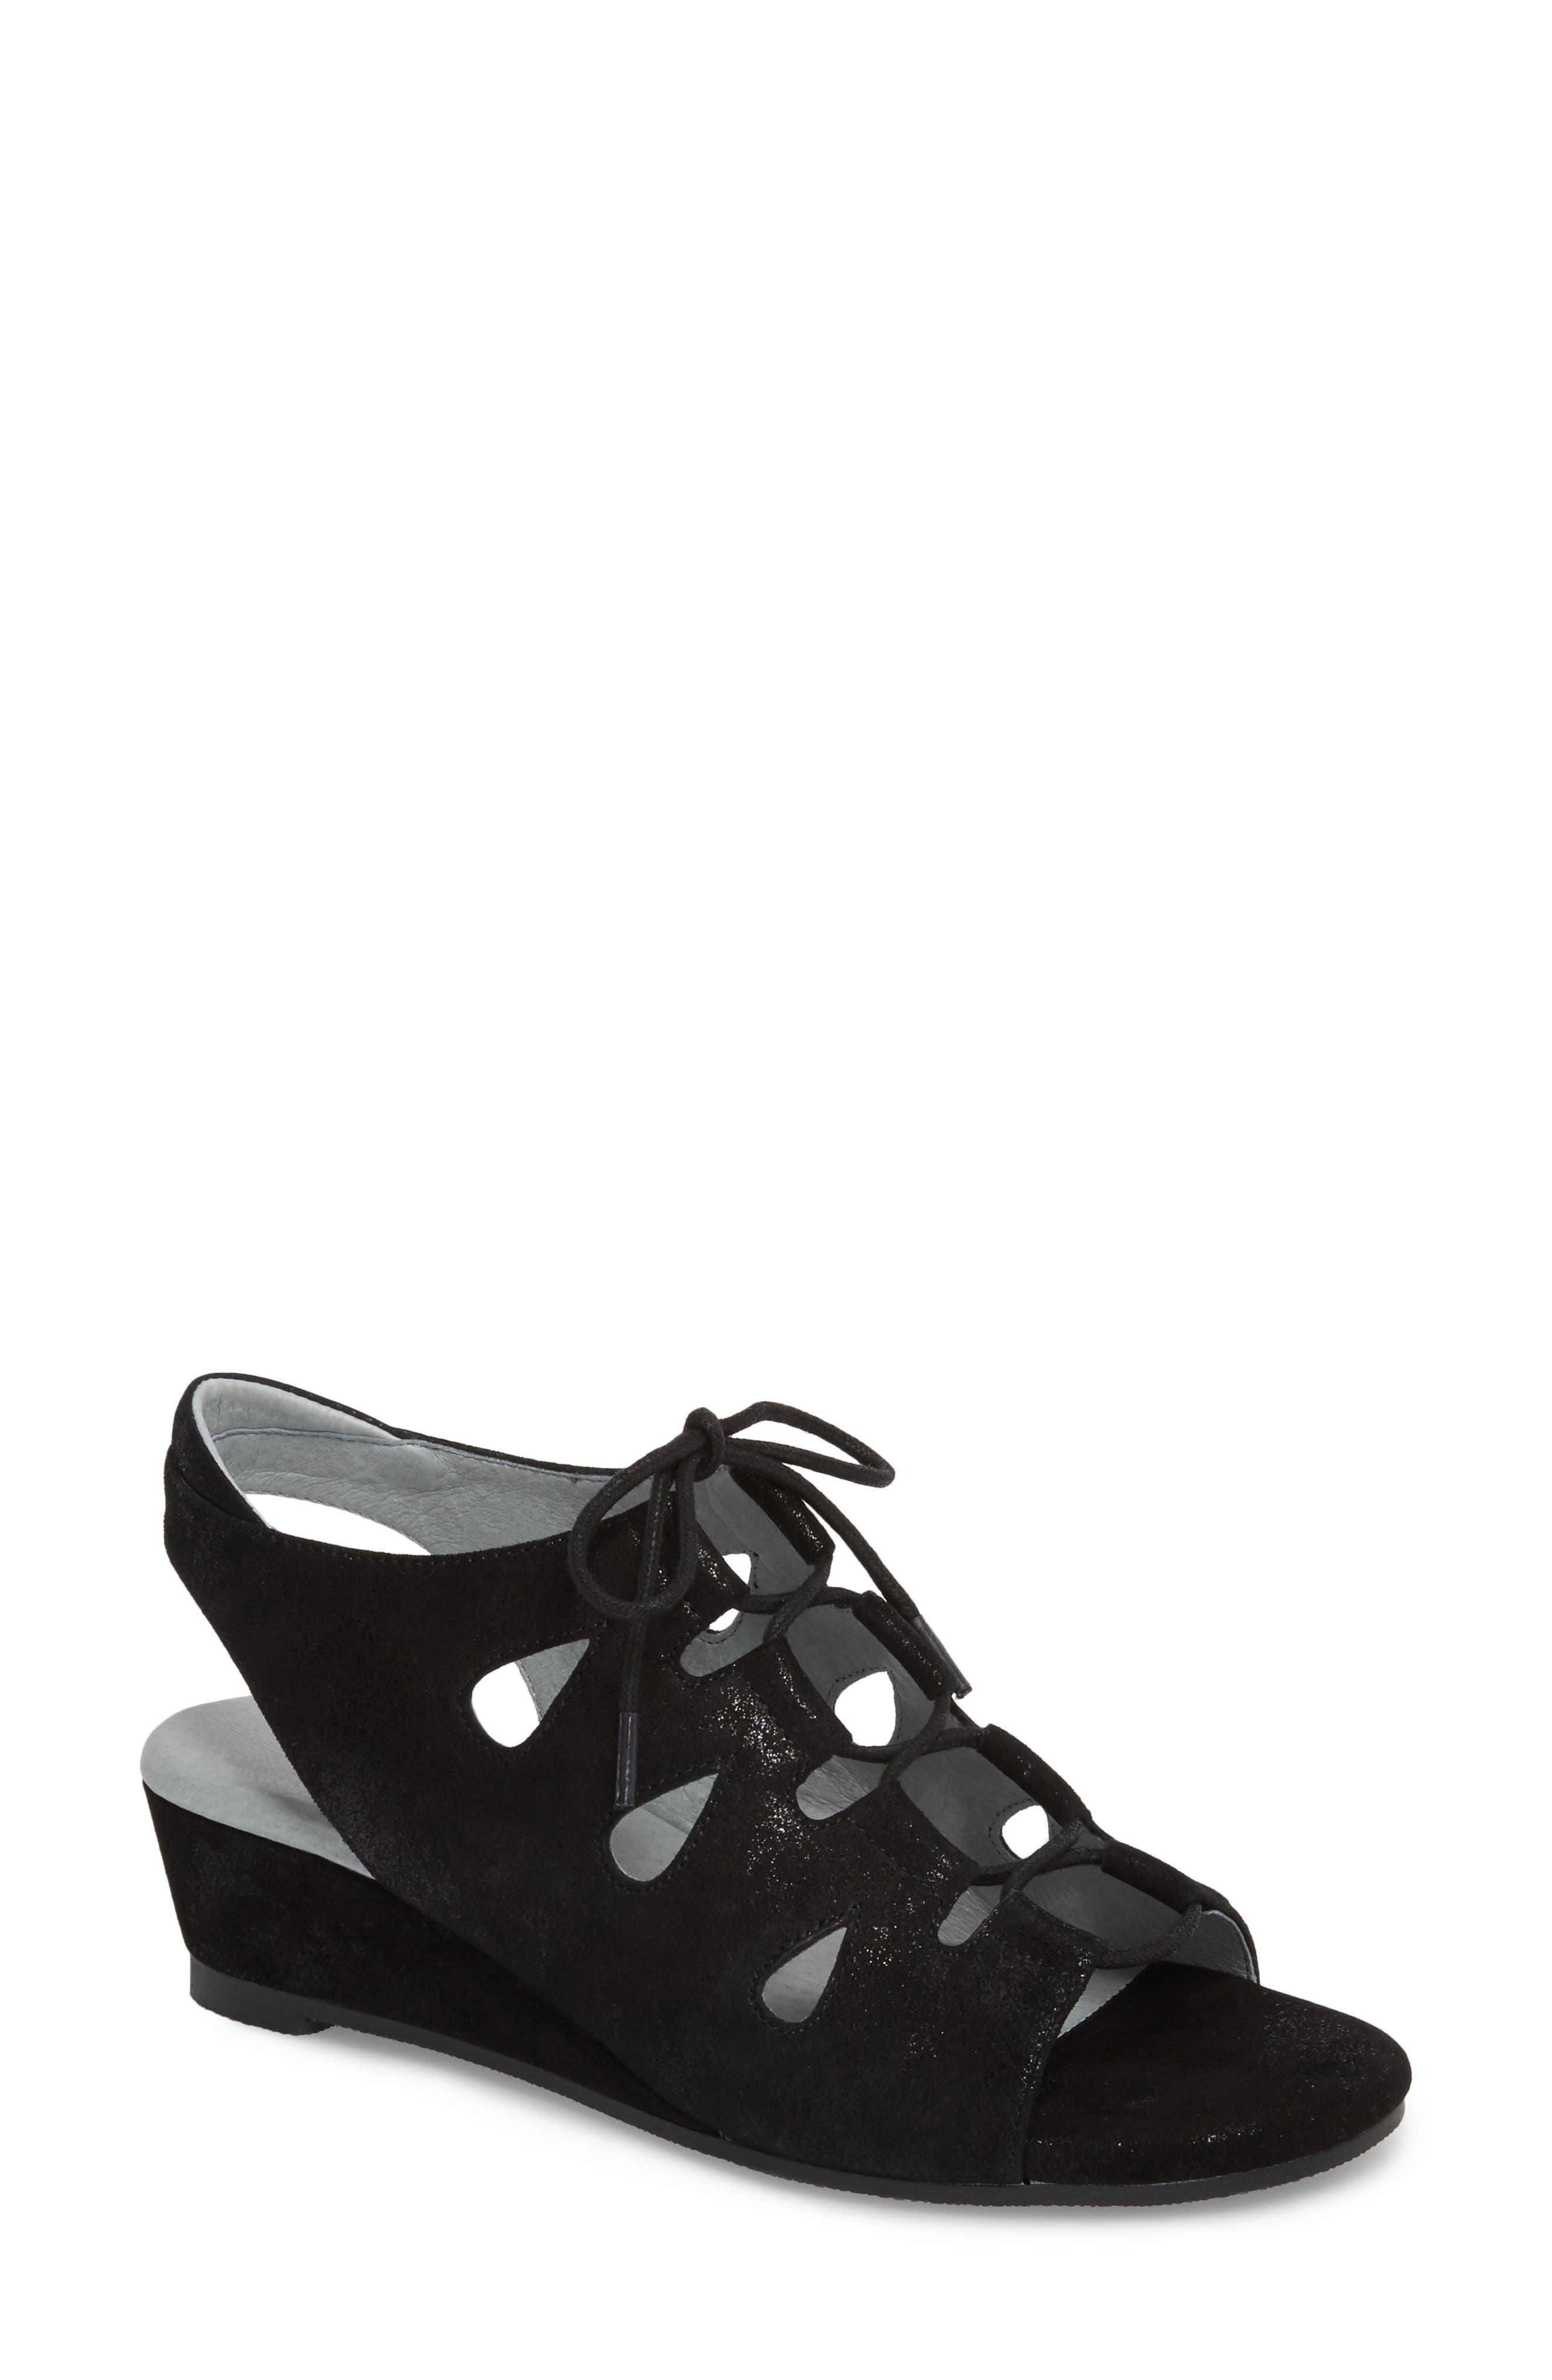 Rich Wedge Sandal,                         Main,                         color, Black Suede